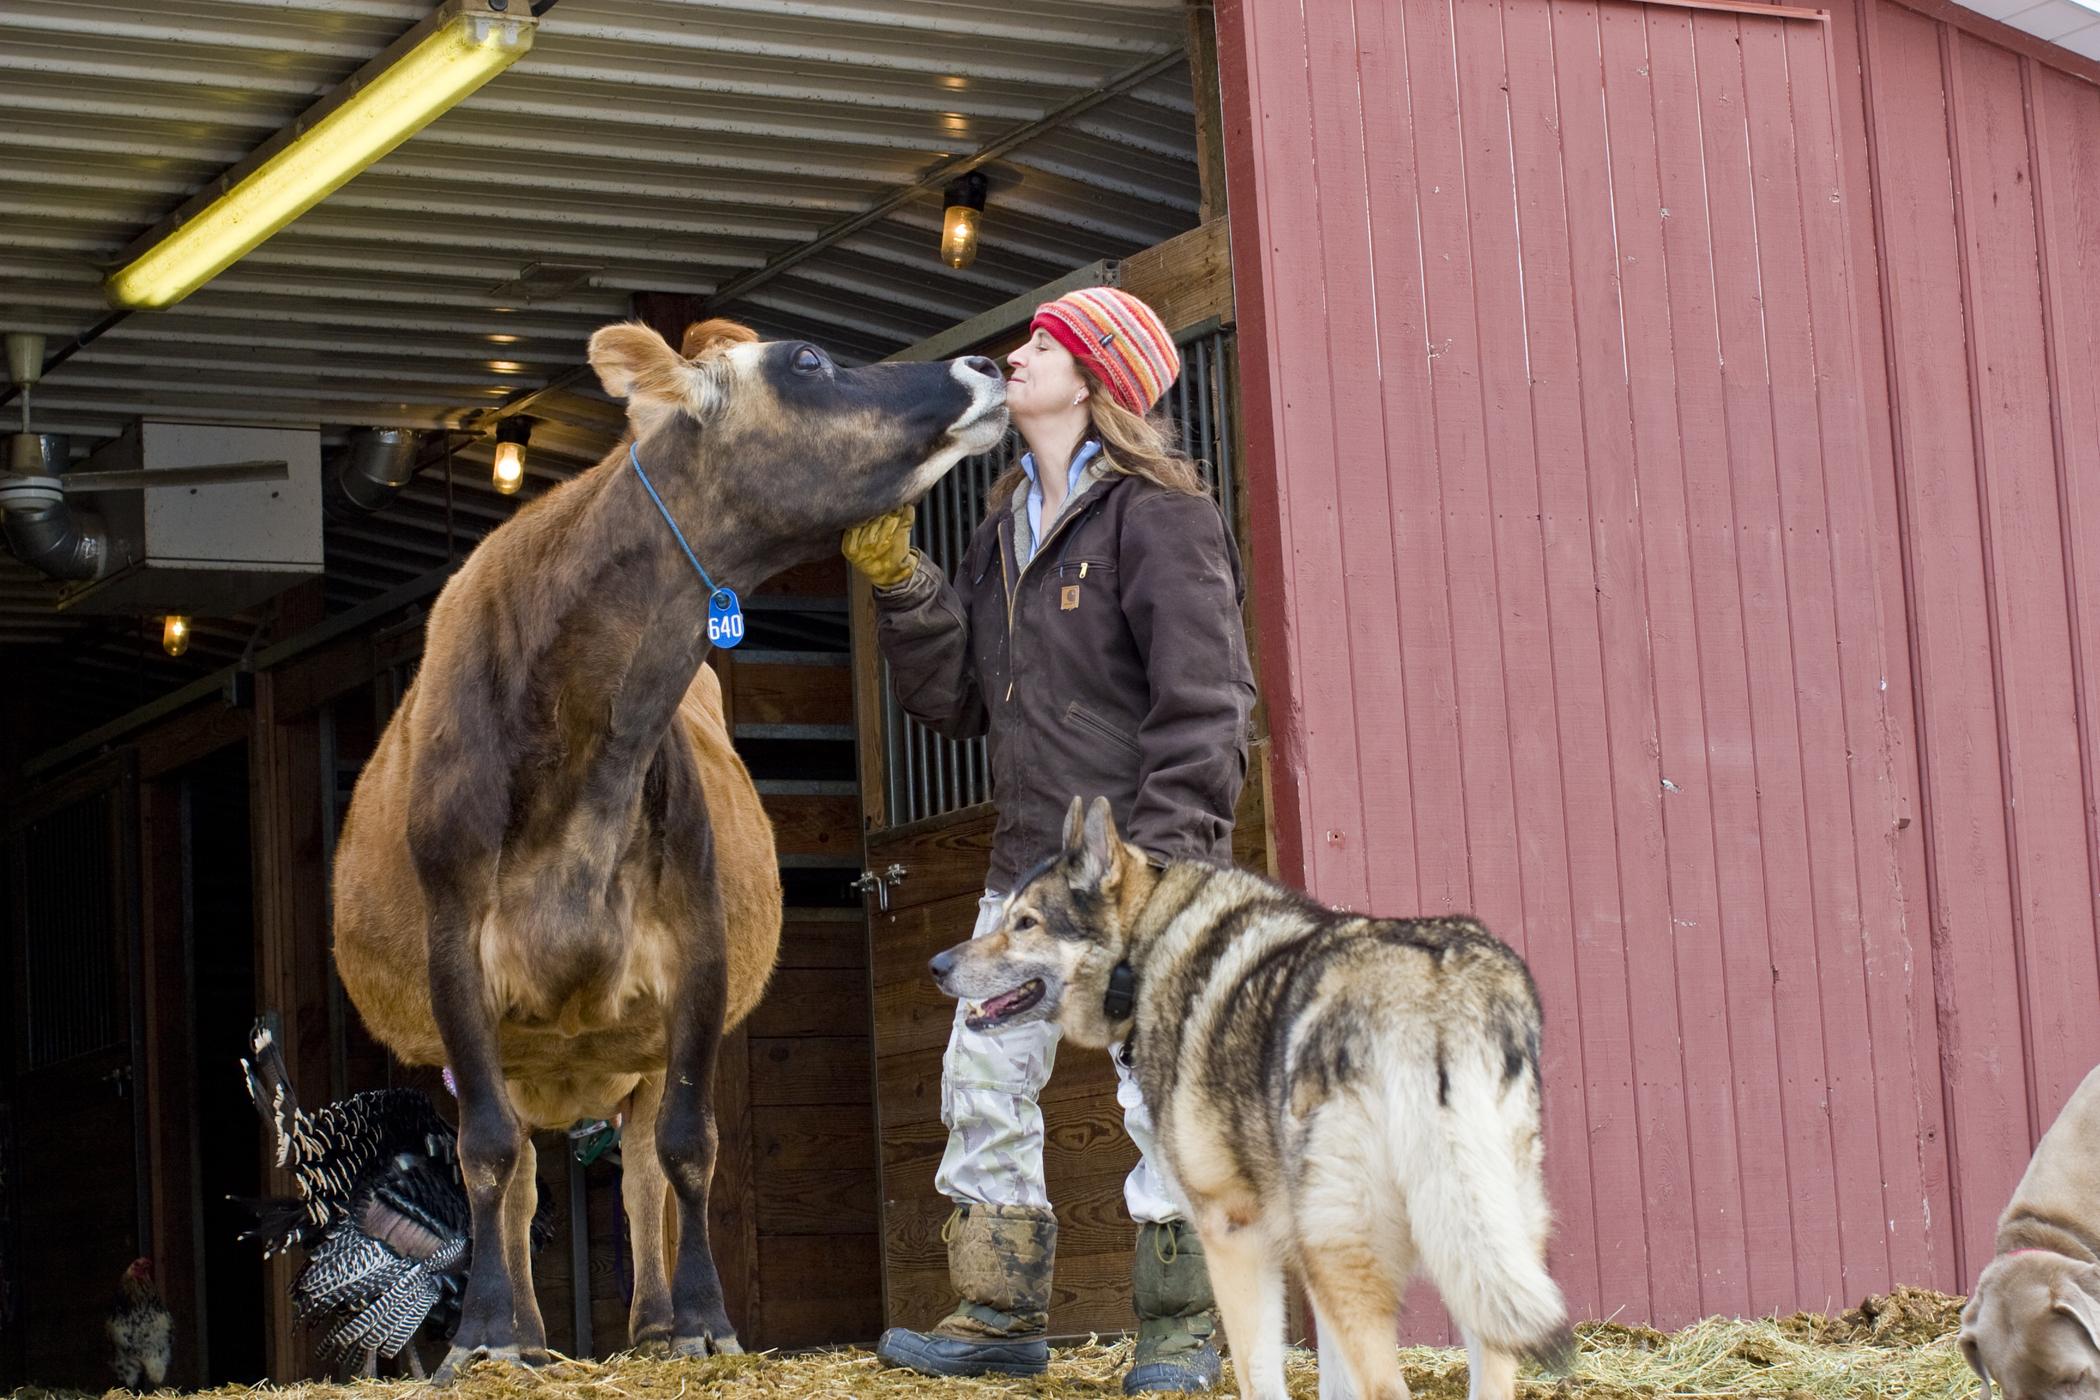 farm photography farmer with cow dog turkey at barn